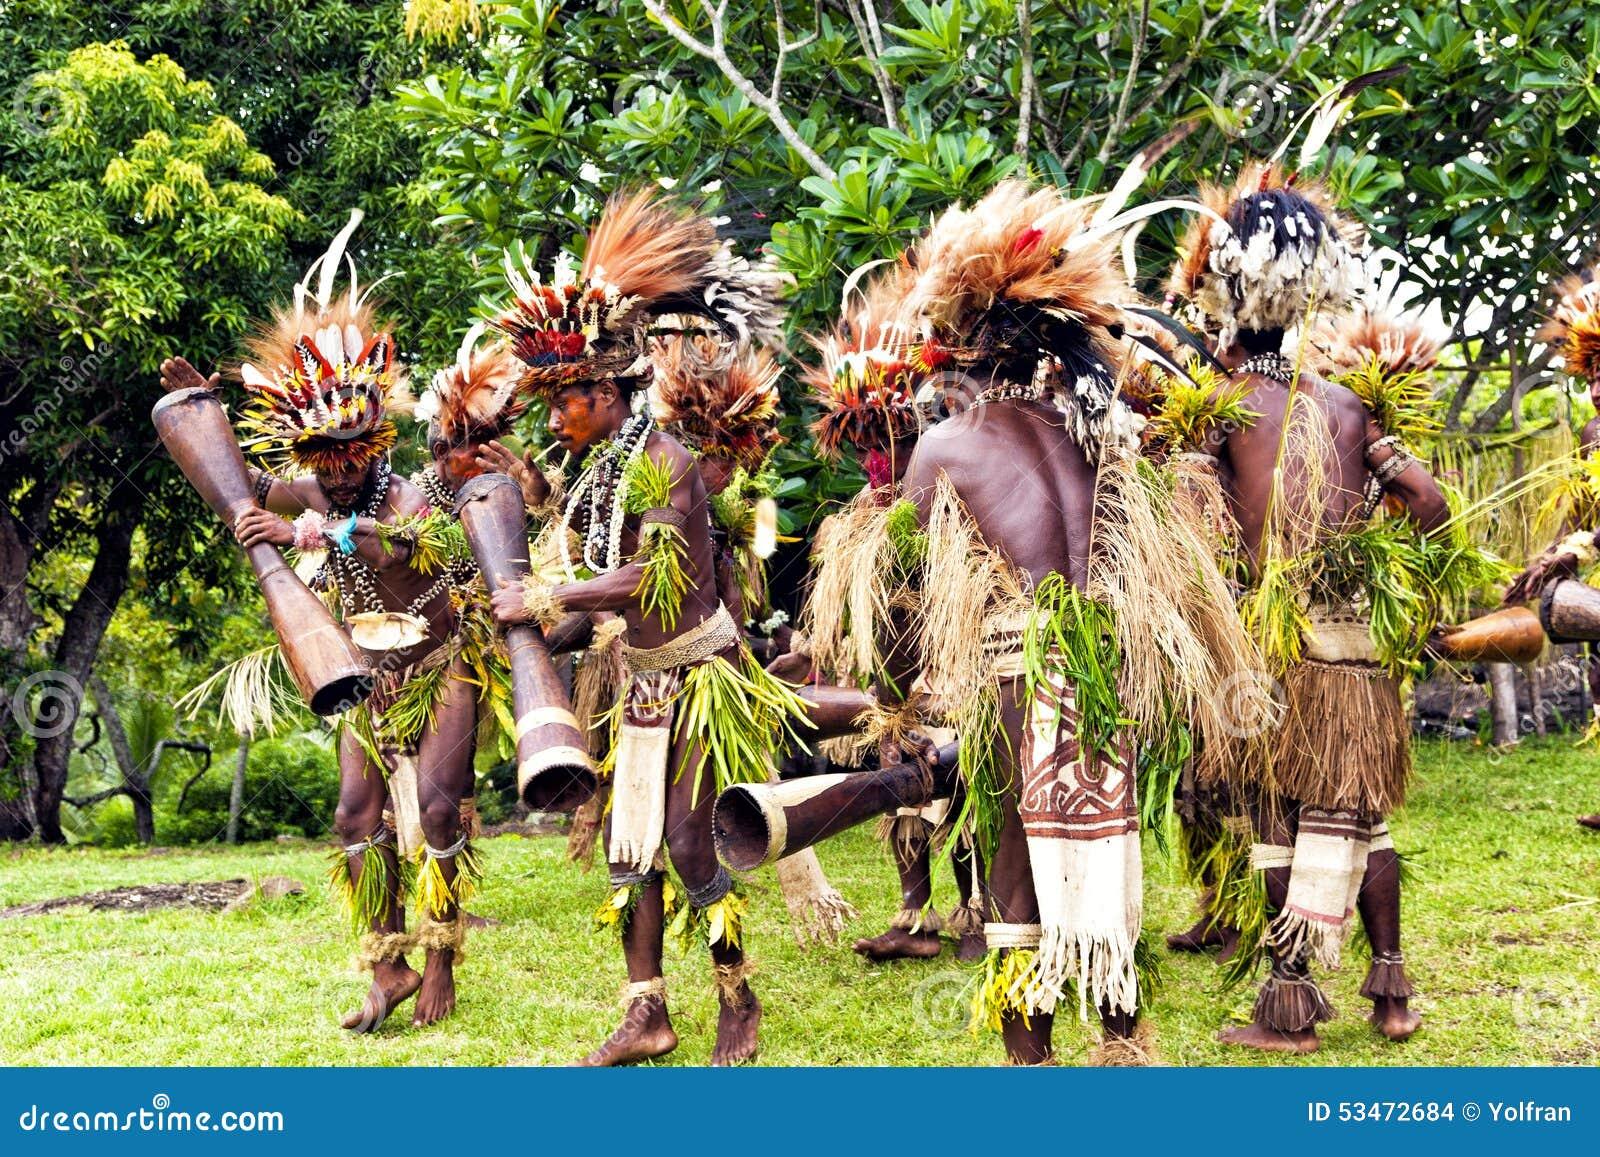 Tufi, Papua New Guinea, 4 December 2008 : Young Papuan tribal warriors ...